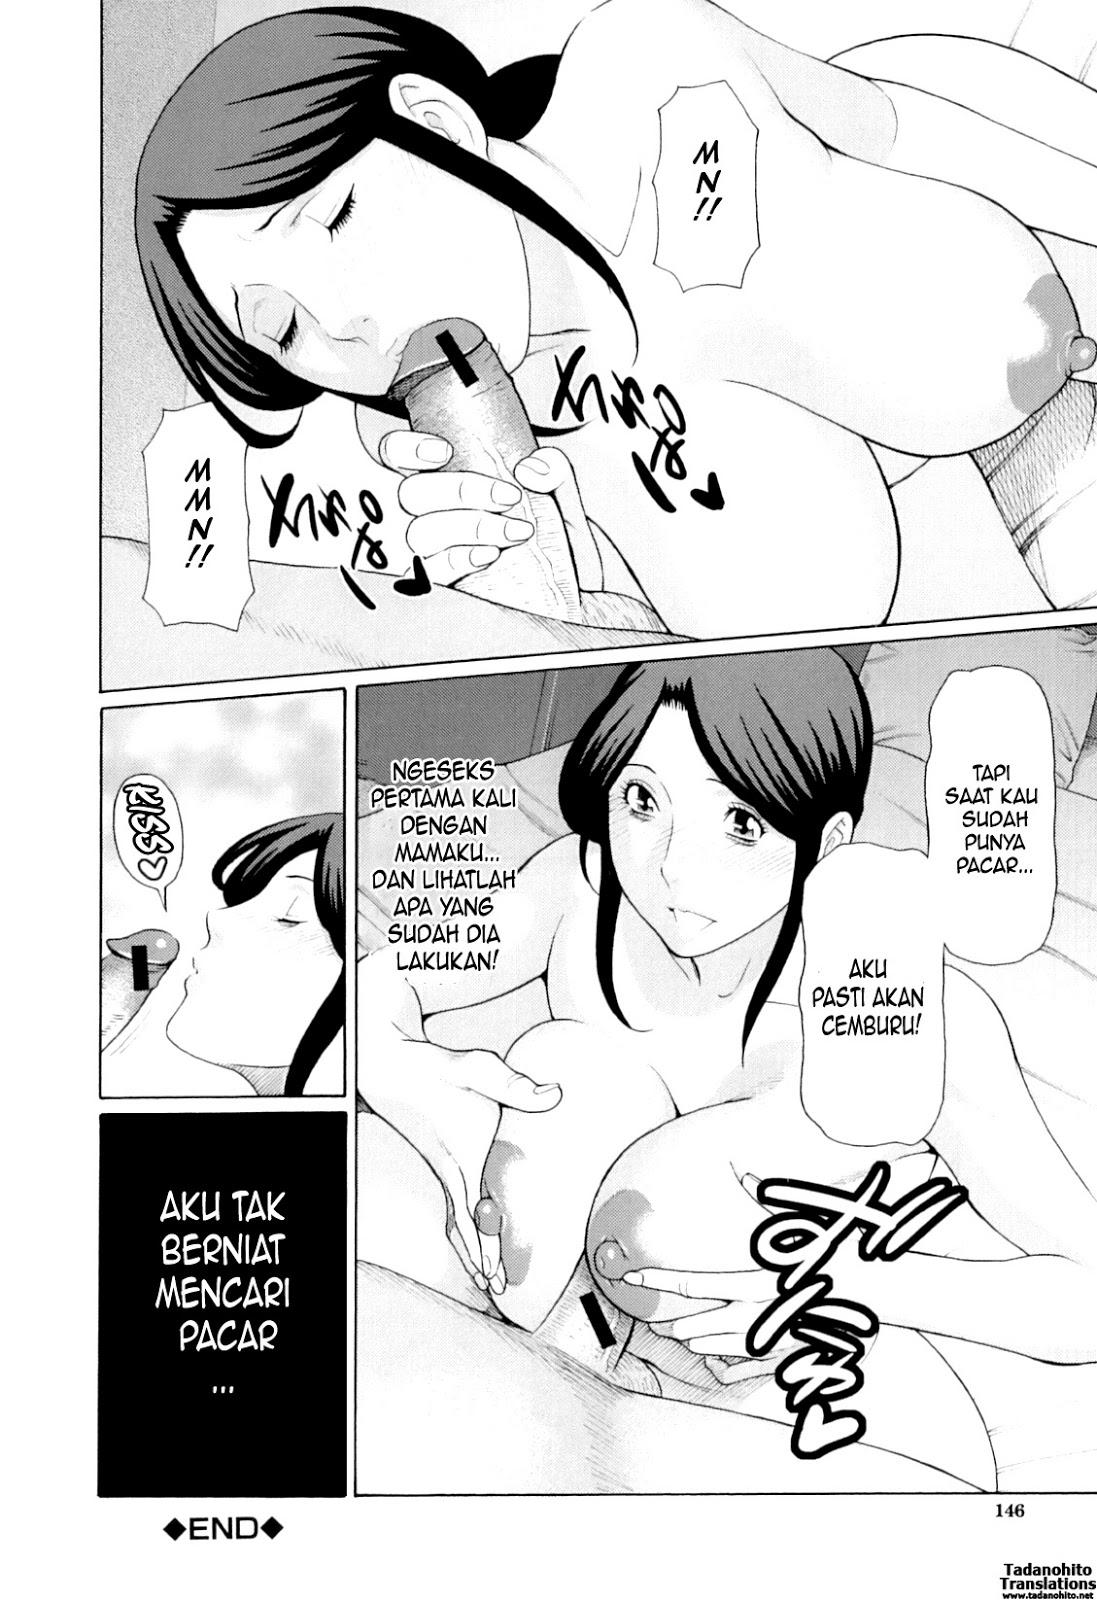 Komik Hentai Manga Hentai Pompa Terus Memek Mama